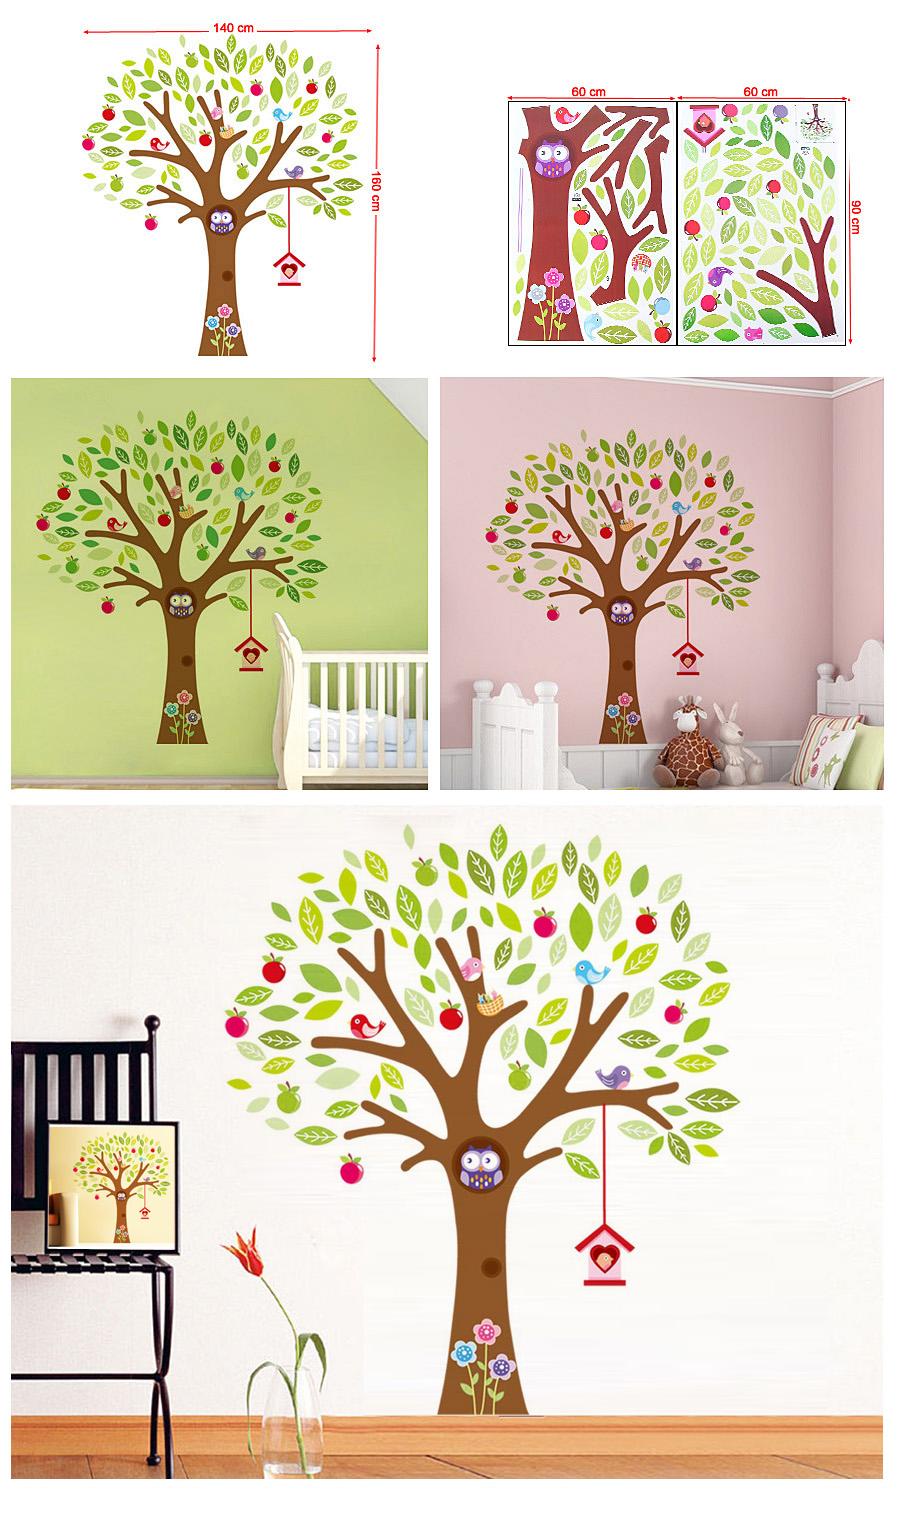 baum wandaufkleber wandsticker wandtattoo wanddeko wanddekoration bunt fwt23c ebay. Black Bedroom Furniture Sets. Home Design Ideas